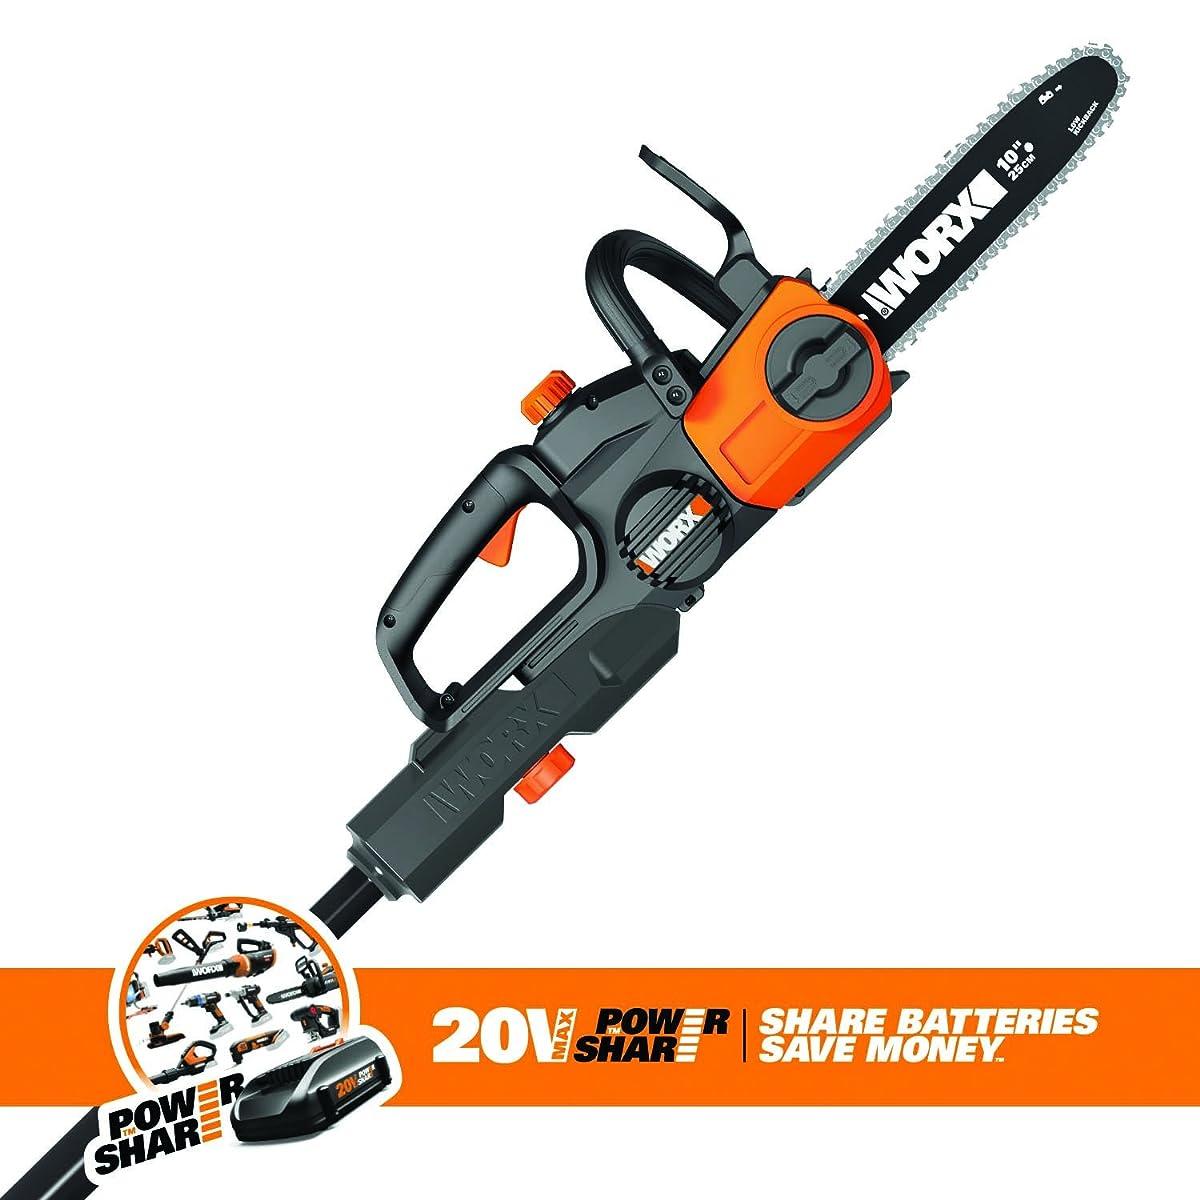 Worx WG323 20V Cordless Pole Chain Saw